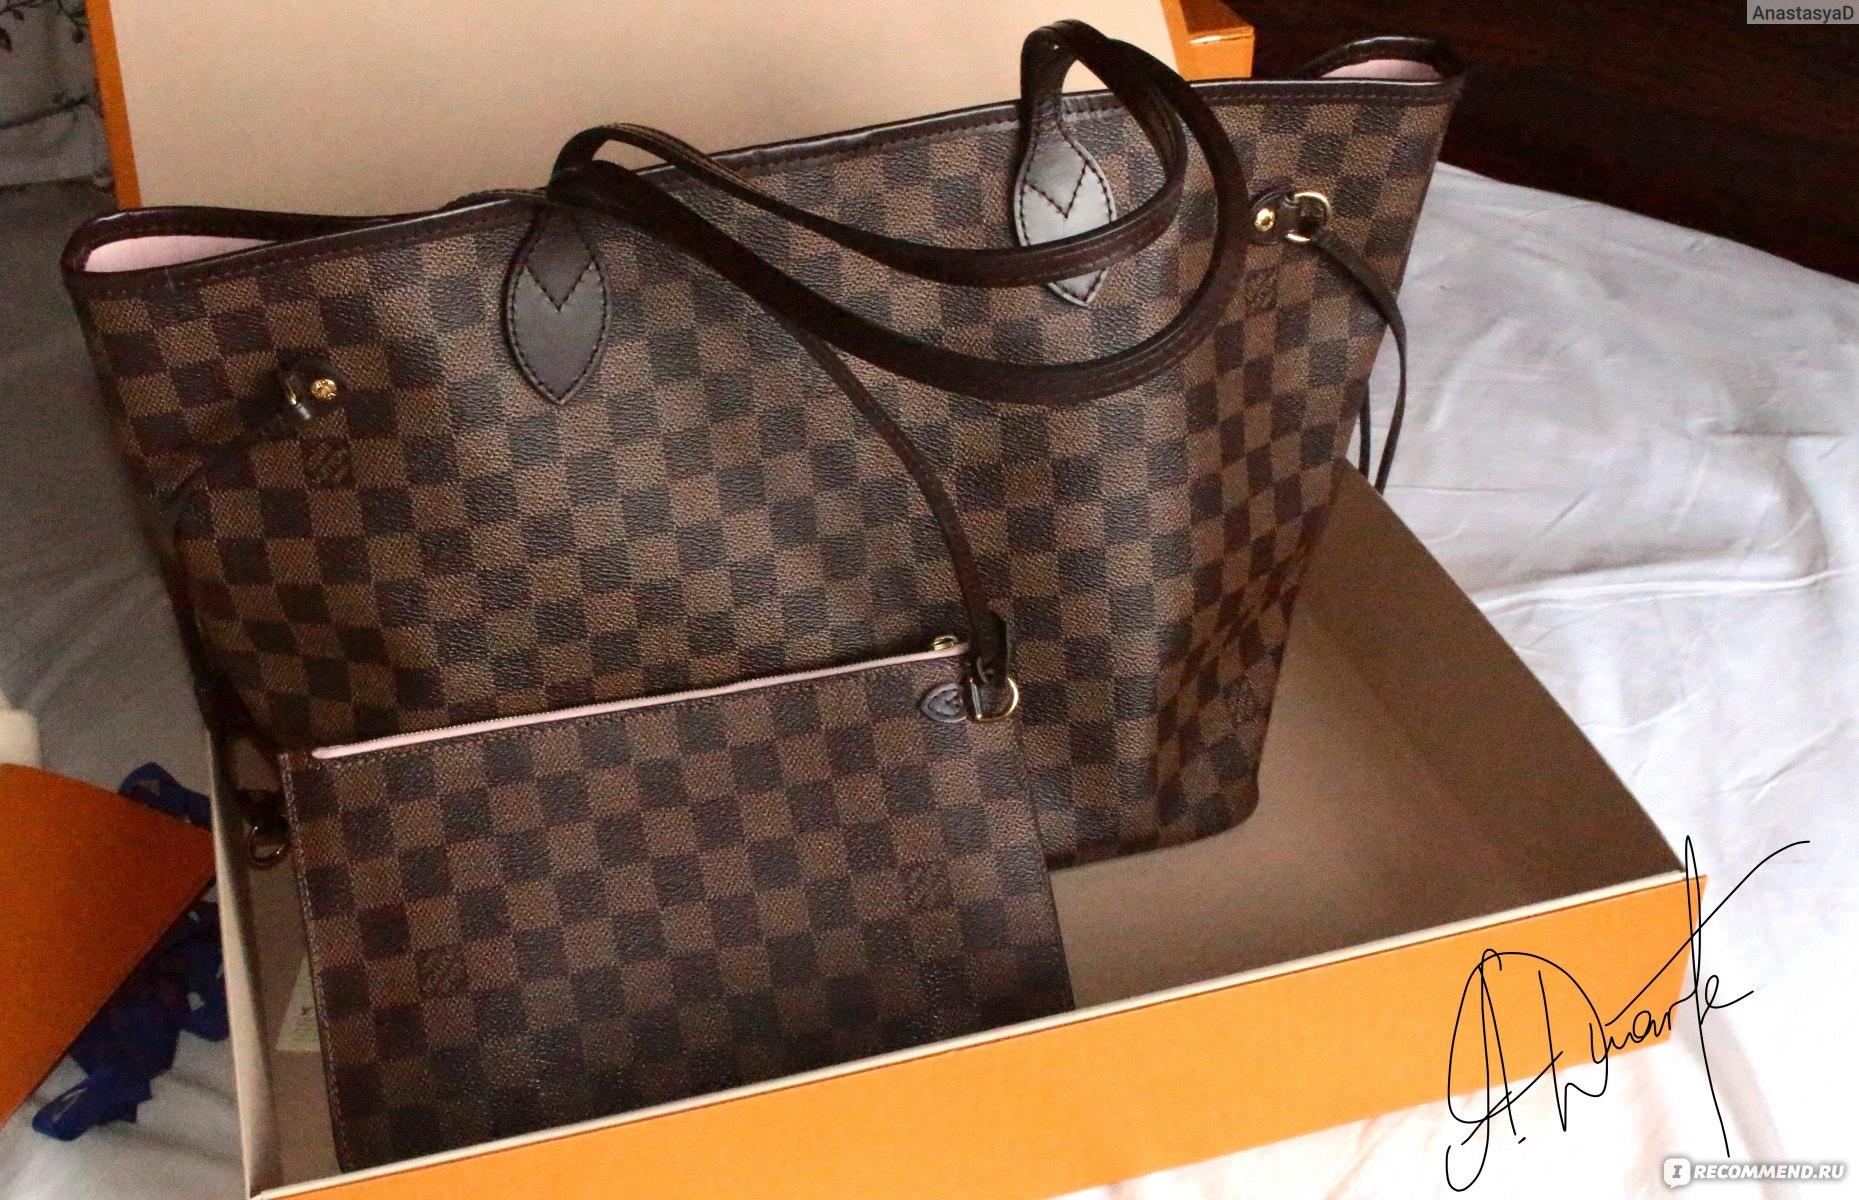 9cce55cf2573 Сумка Louis Vuitton Neverfull - «Сумка-икона Louis Vuitton NEVERFULL ...